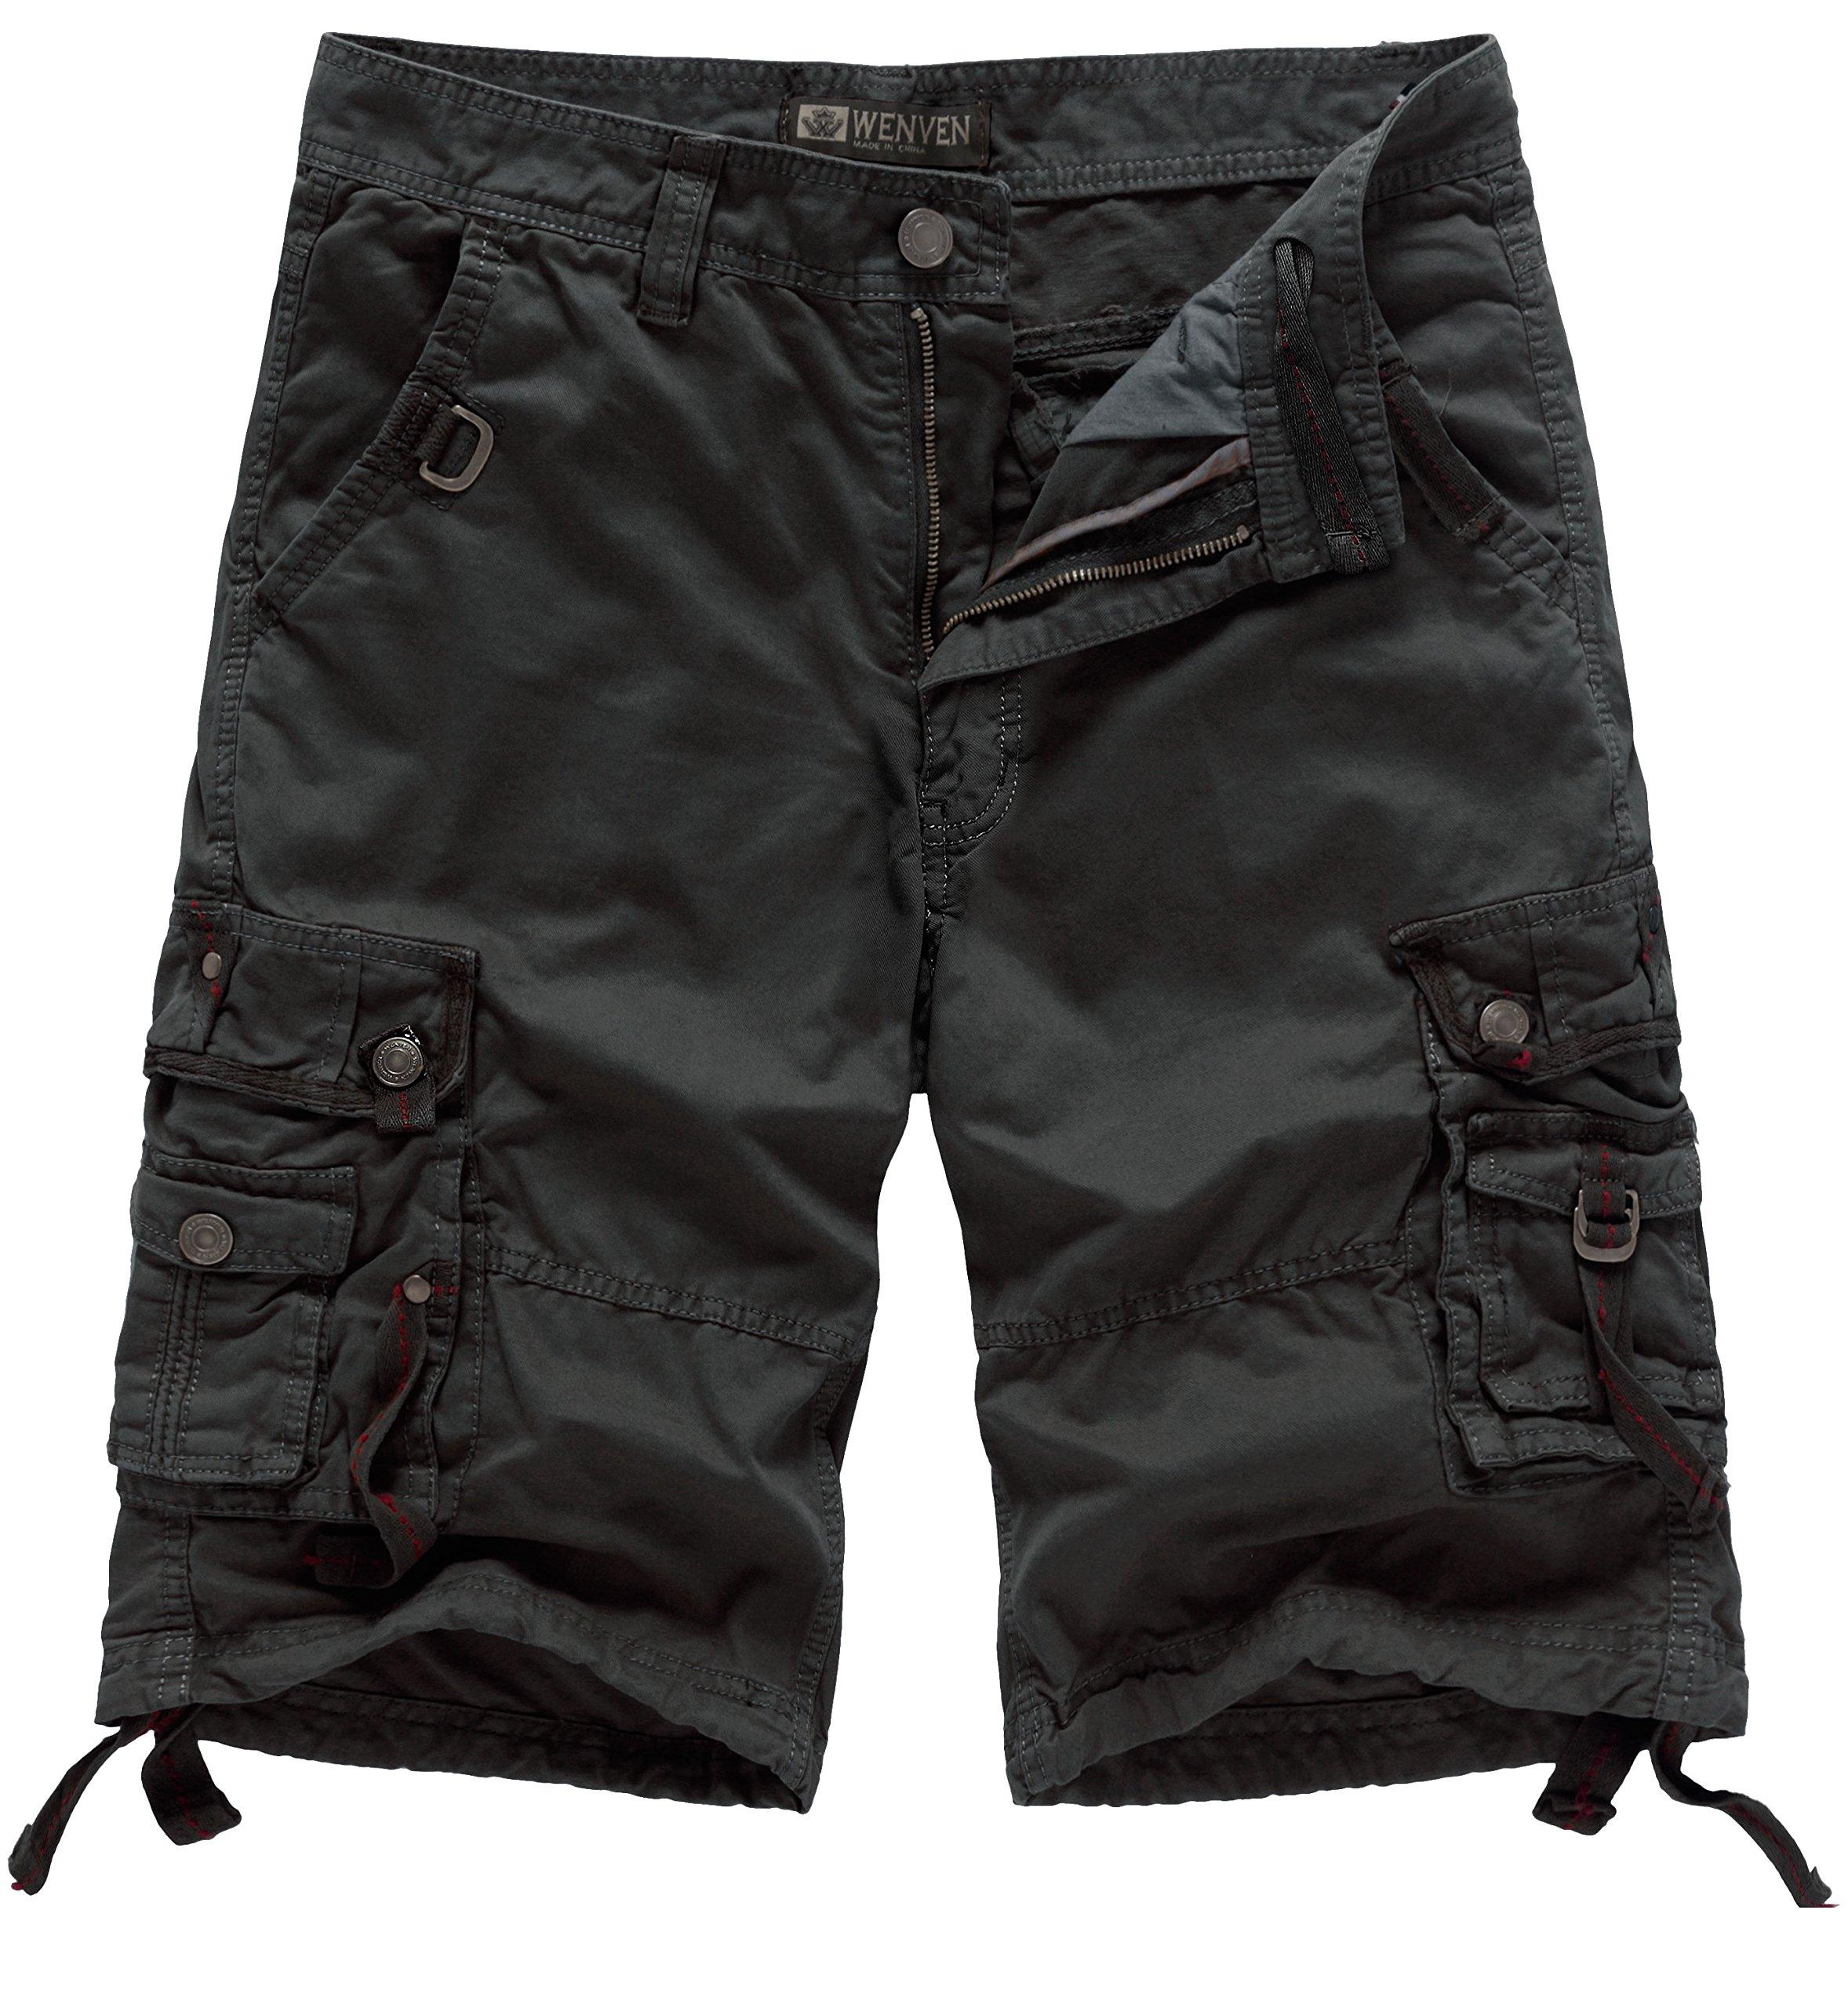 WenVen Men's Casual Cargo Short Pants Military Outdoor Wear Lightweight(WV3233 Light Black,38)